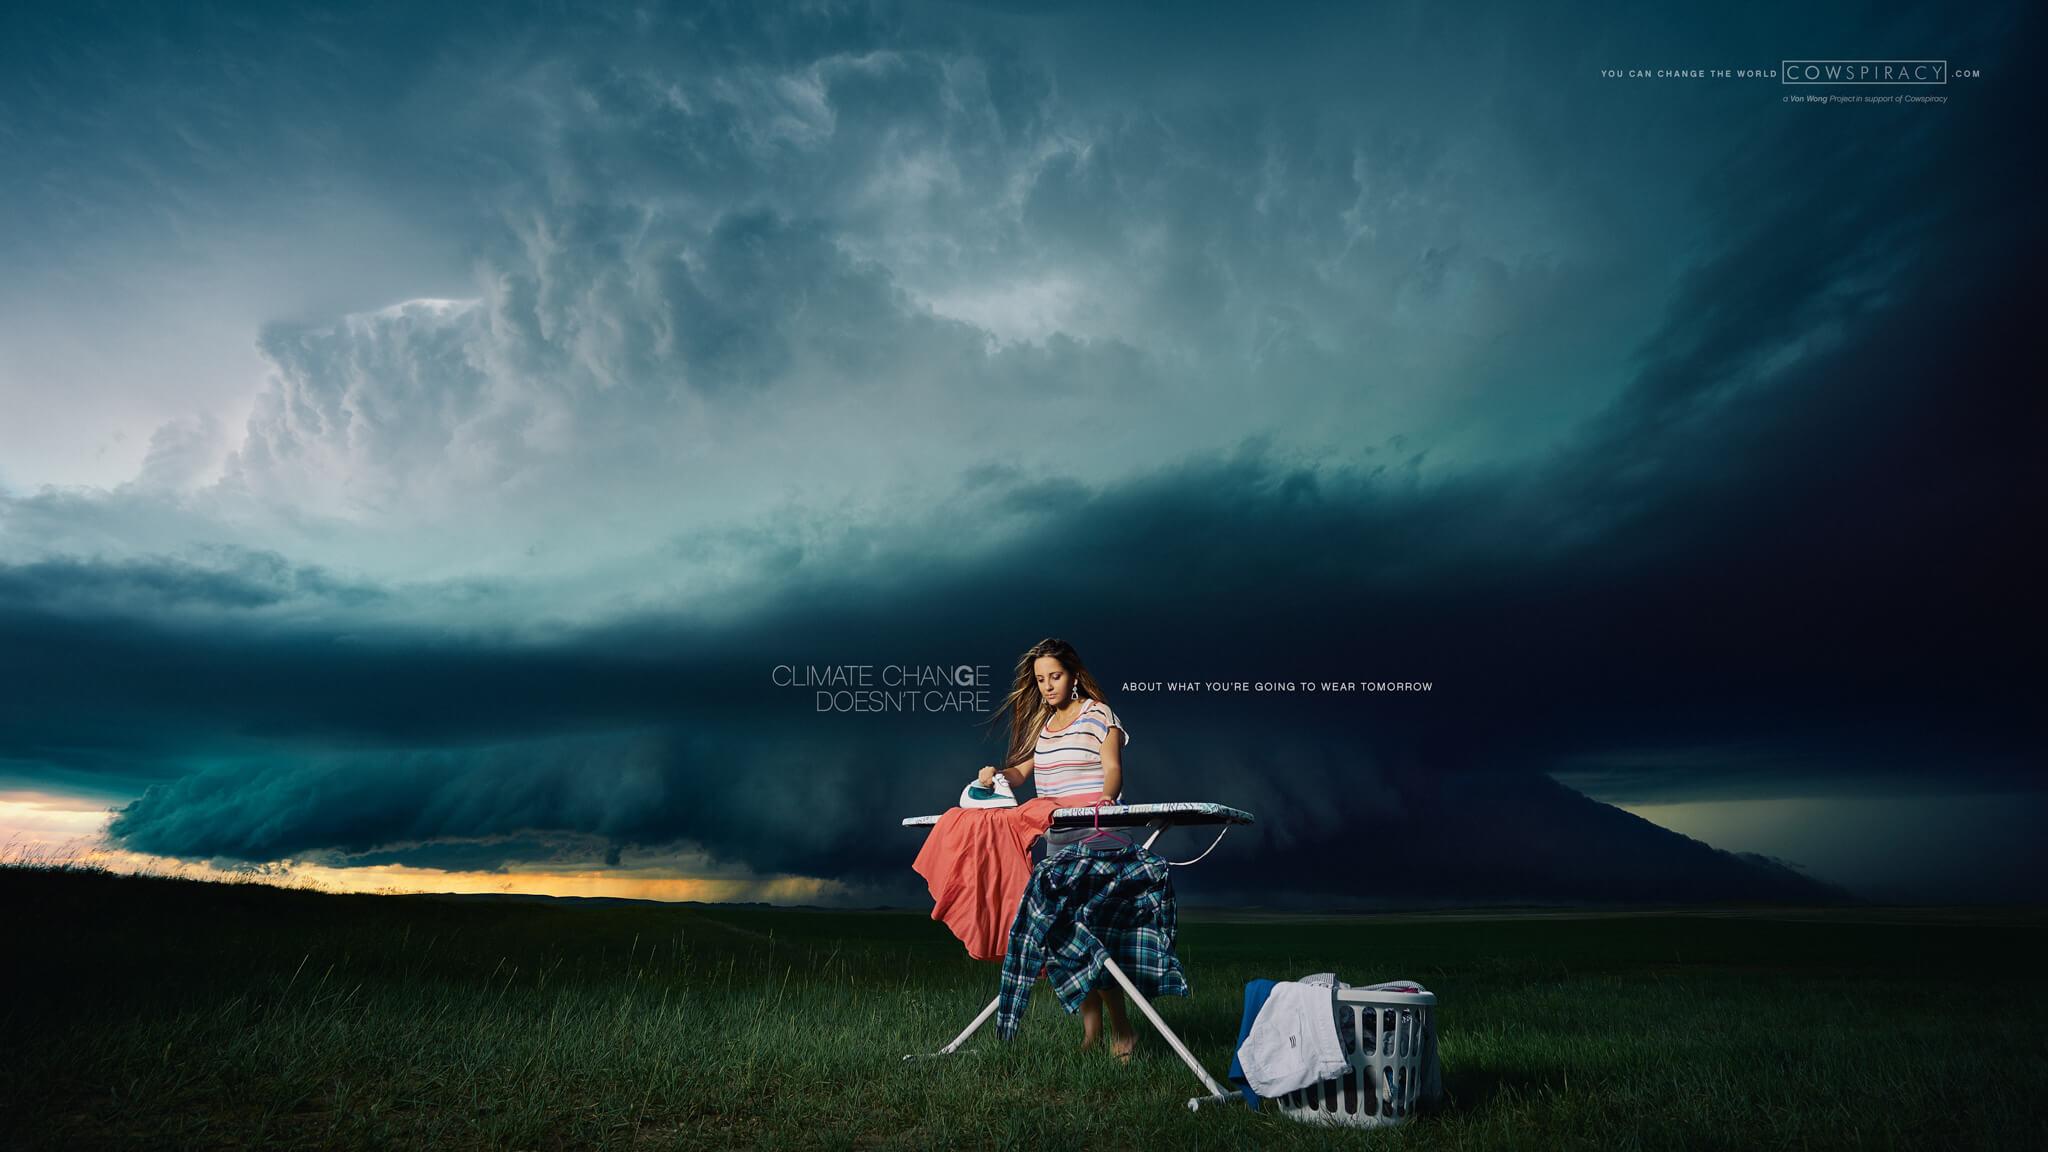 Falling Skies Wallpaper Hd Surreal Stormchasing Portraits Von Wong Blog